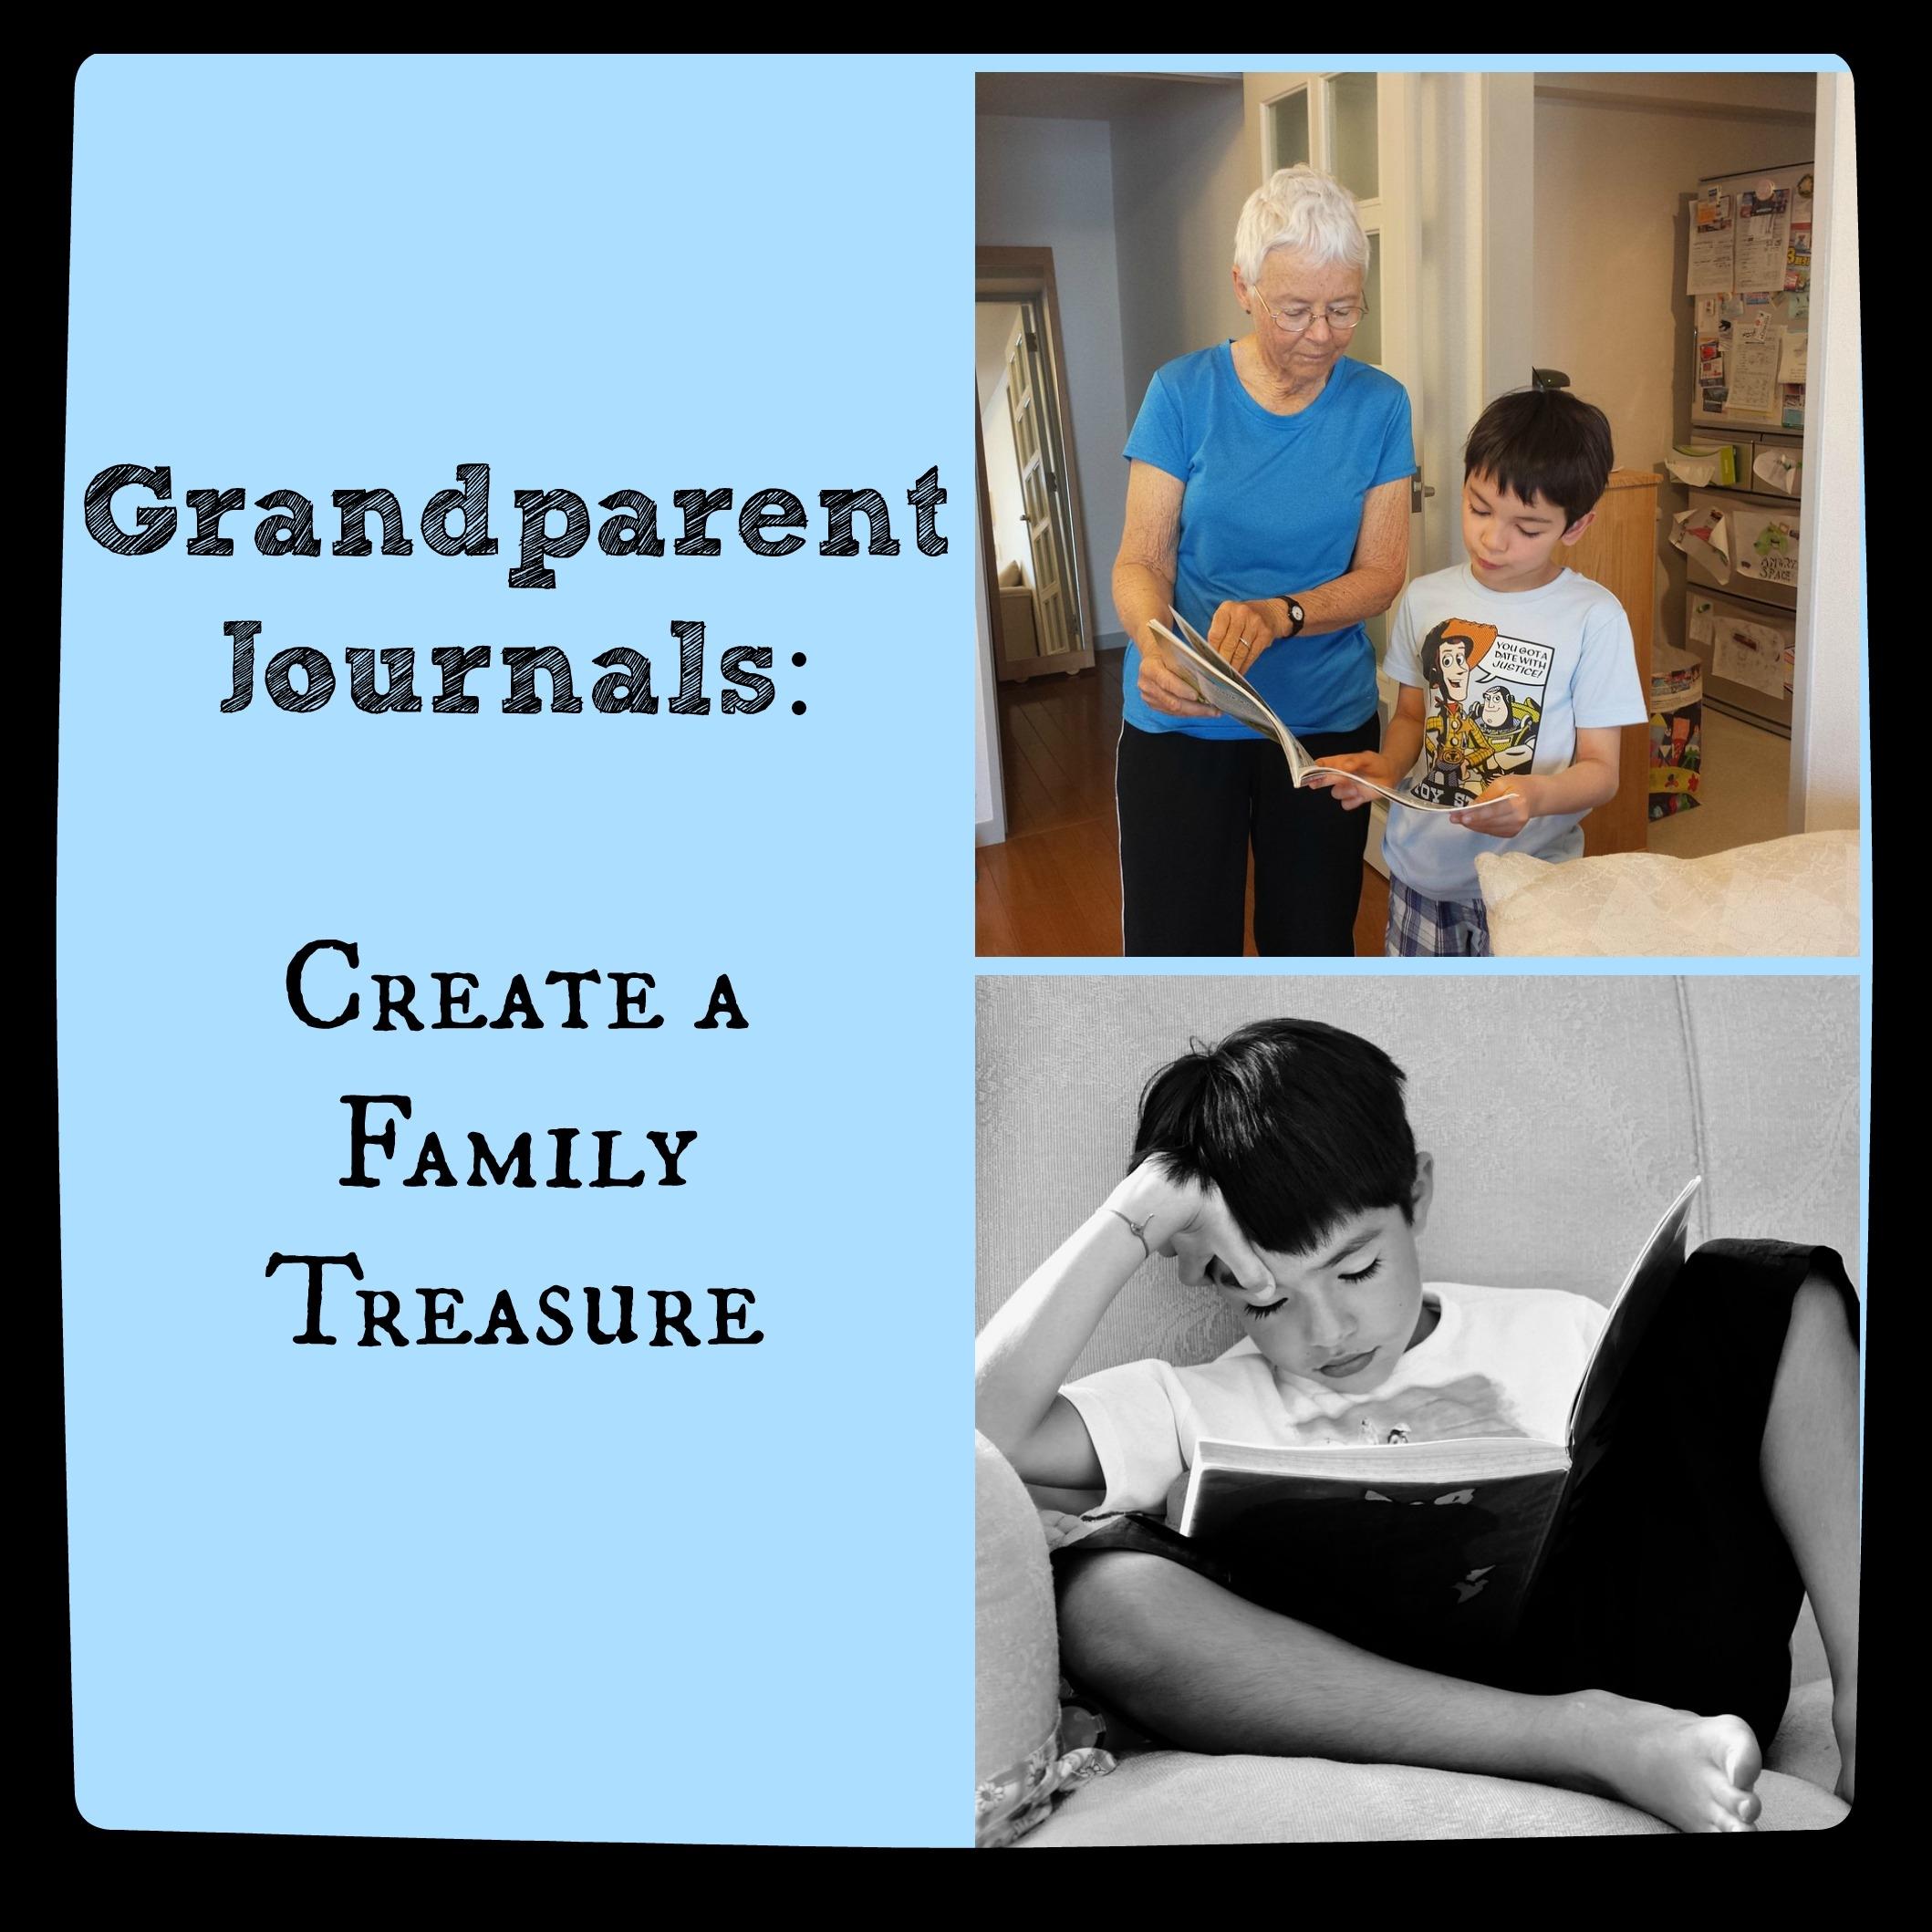 grandparent journals.jpg